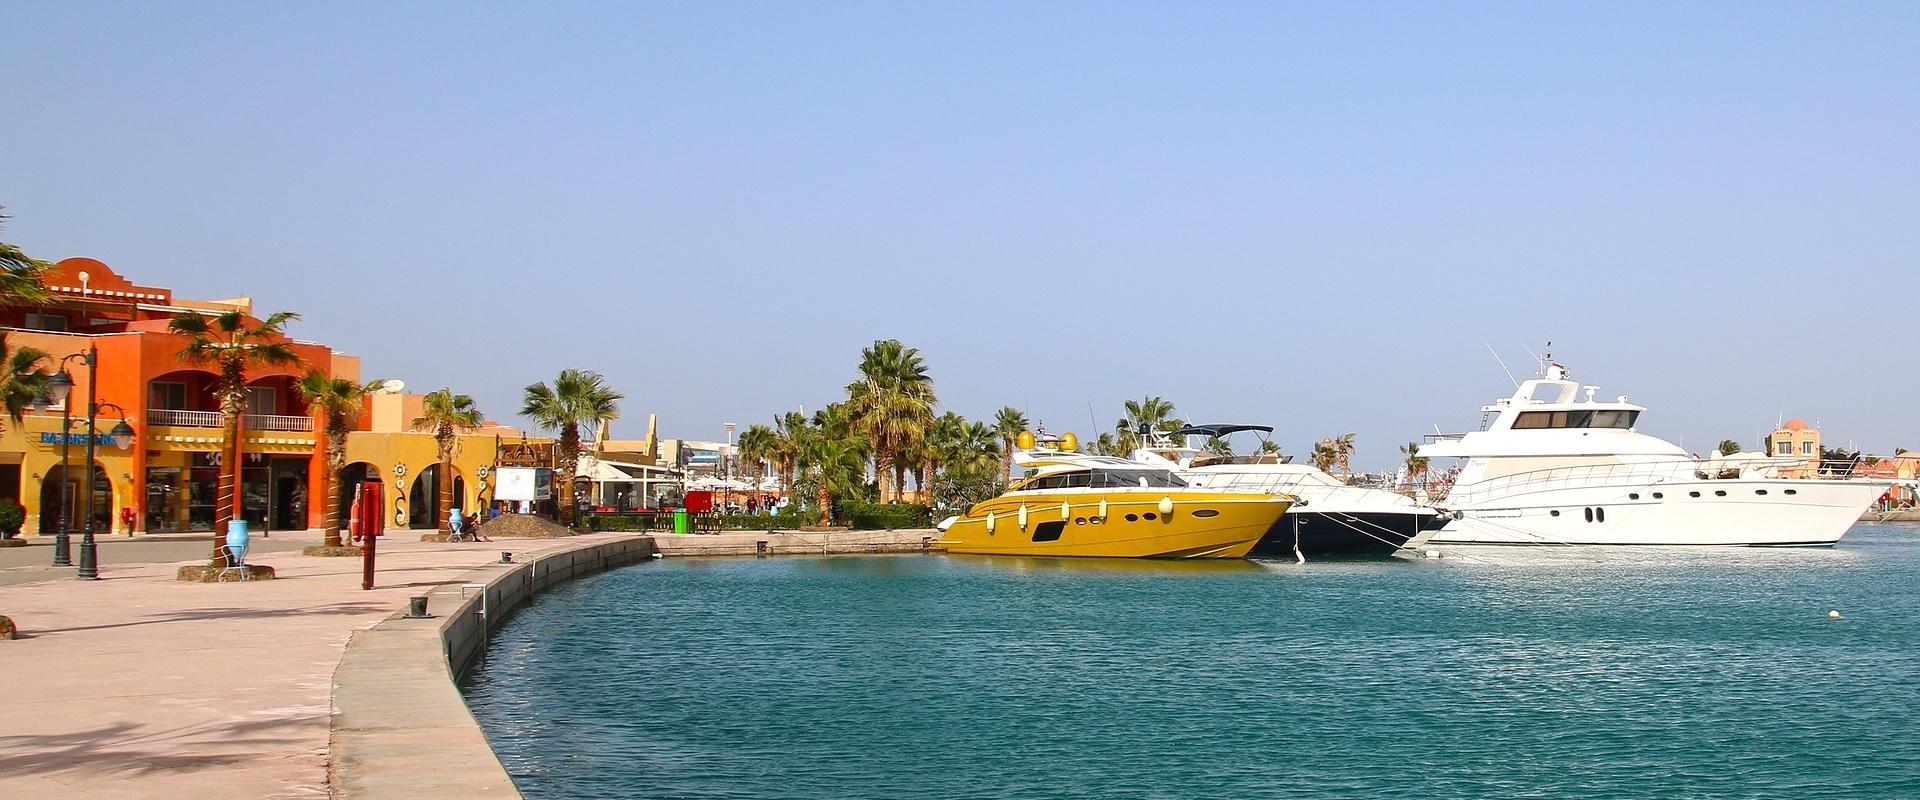 Hurghada - kurort w Egipcie